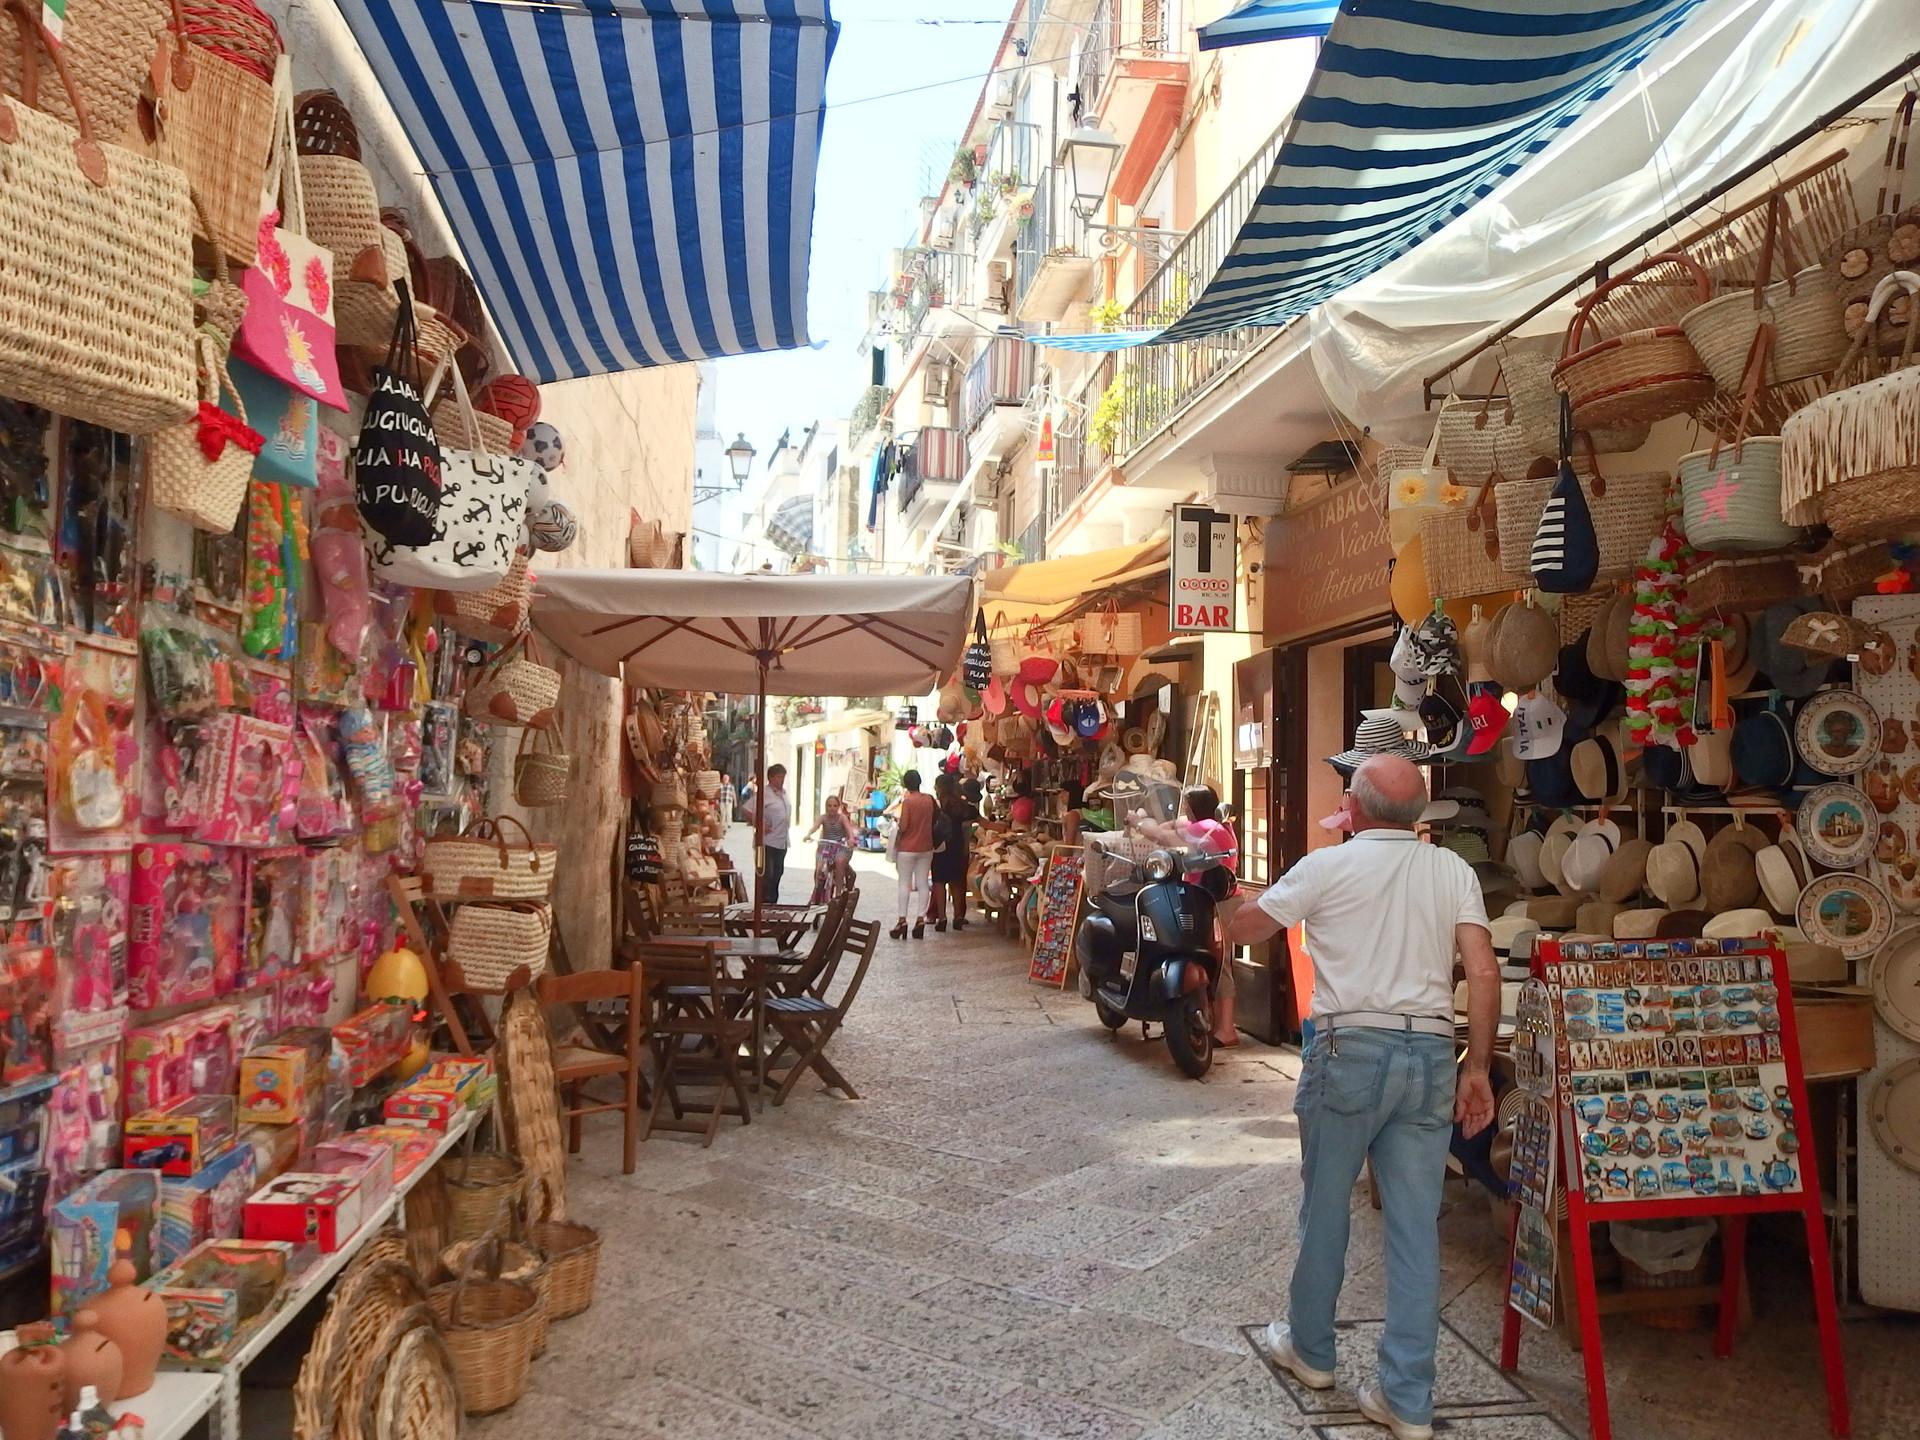 Expérience à Bari, Italie par Eleonora